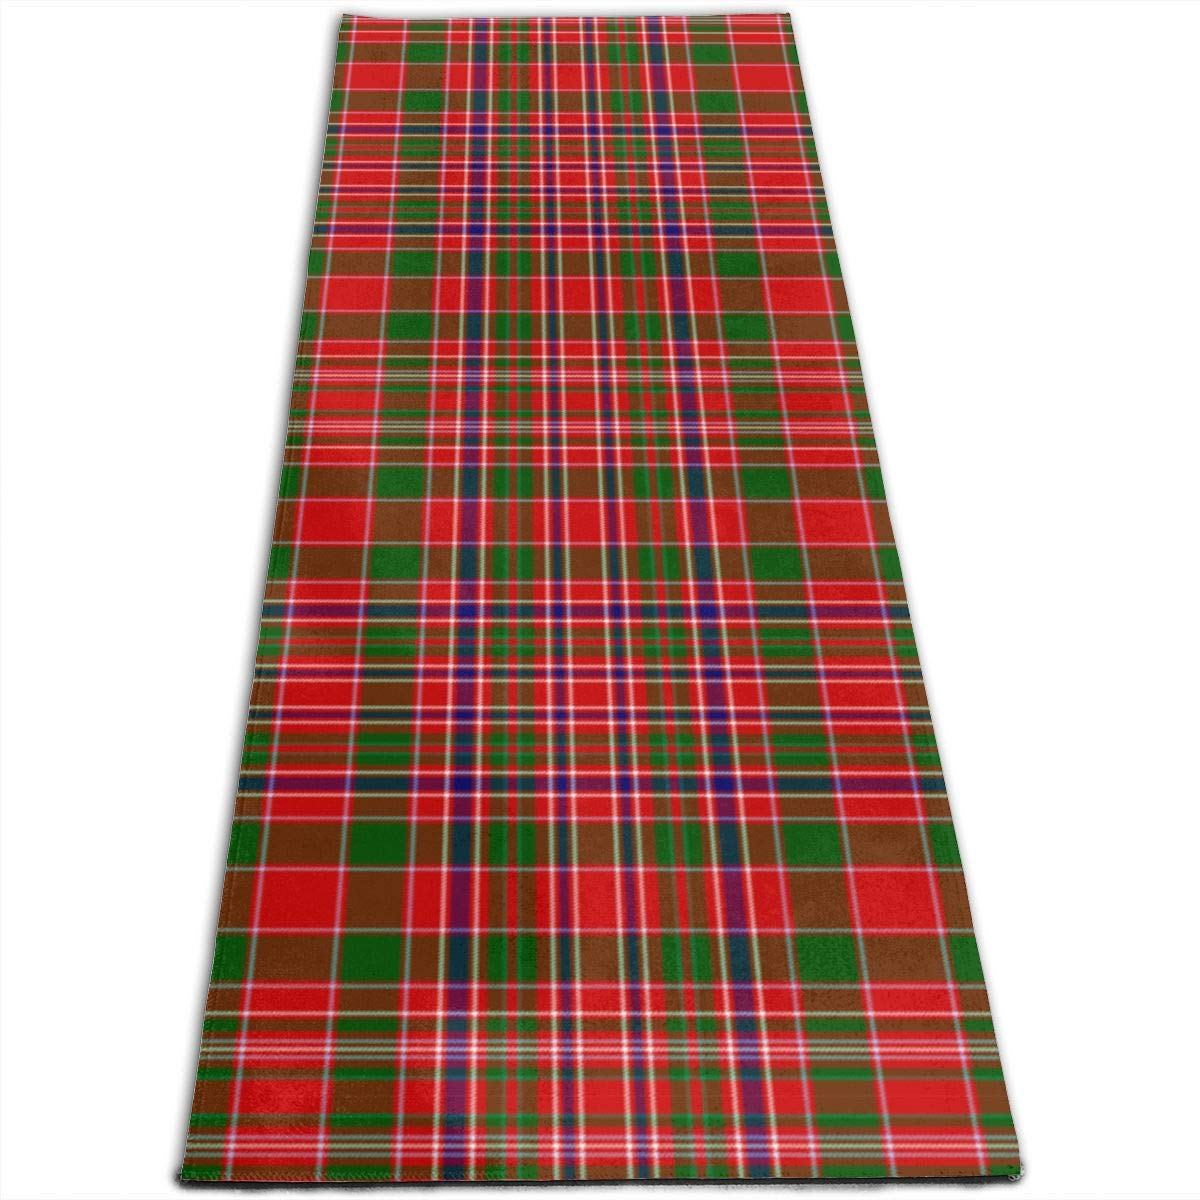 Amazon.com: Scottish Plaid Red Green Pattern Printed Yoga ...